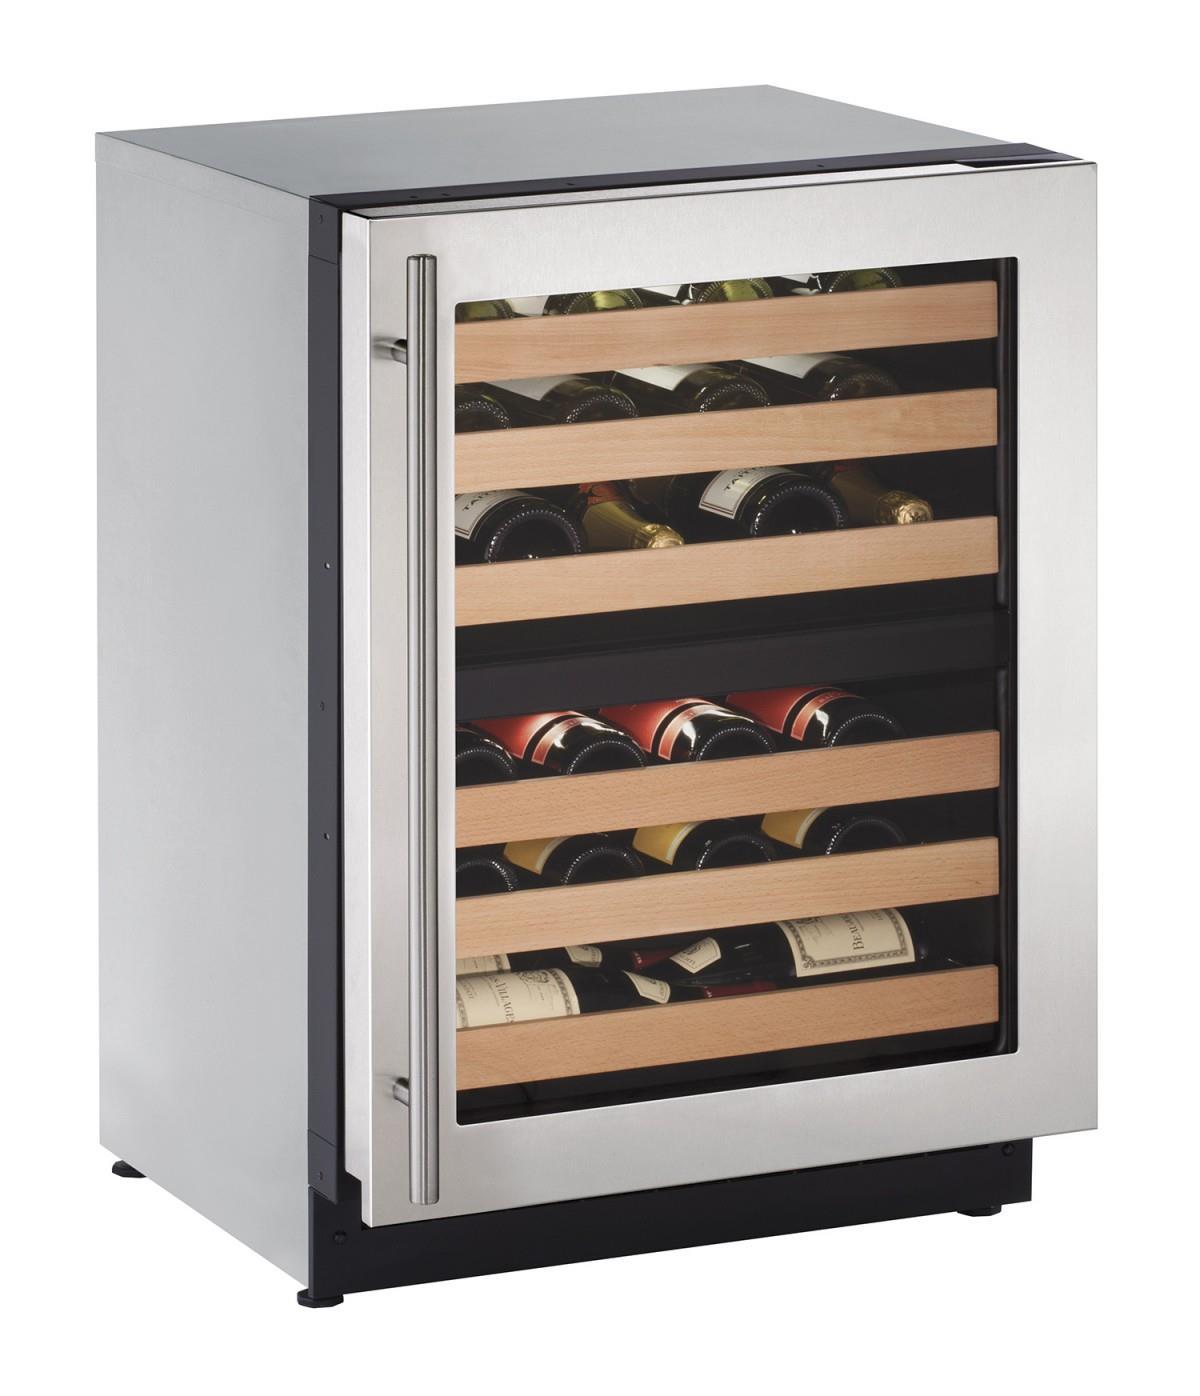 "U-Line Wine Captains 4.7 Cu. Ft. 24"" Built-in Wine Storage - Item Number: U-2224ZWCS-15A"